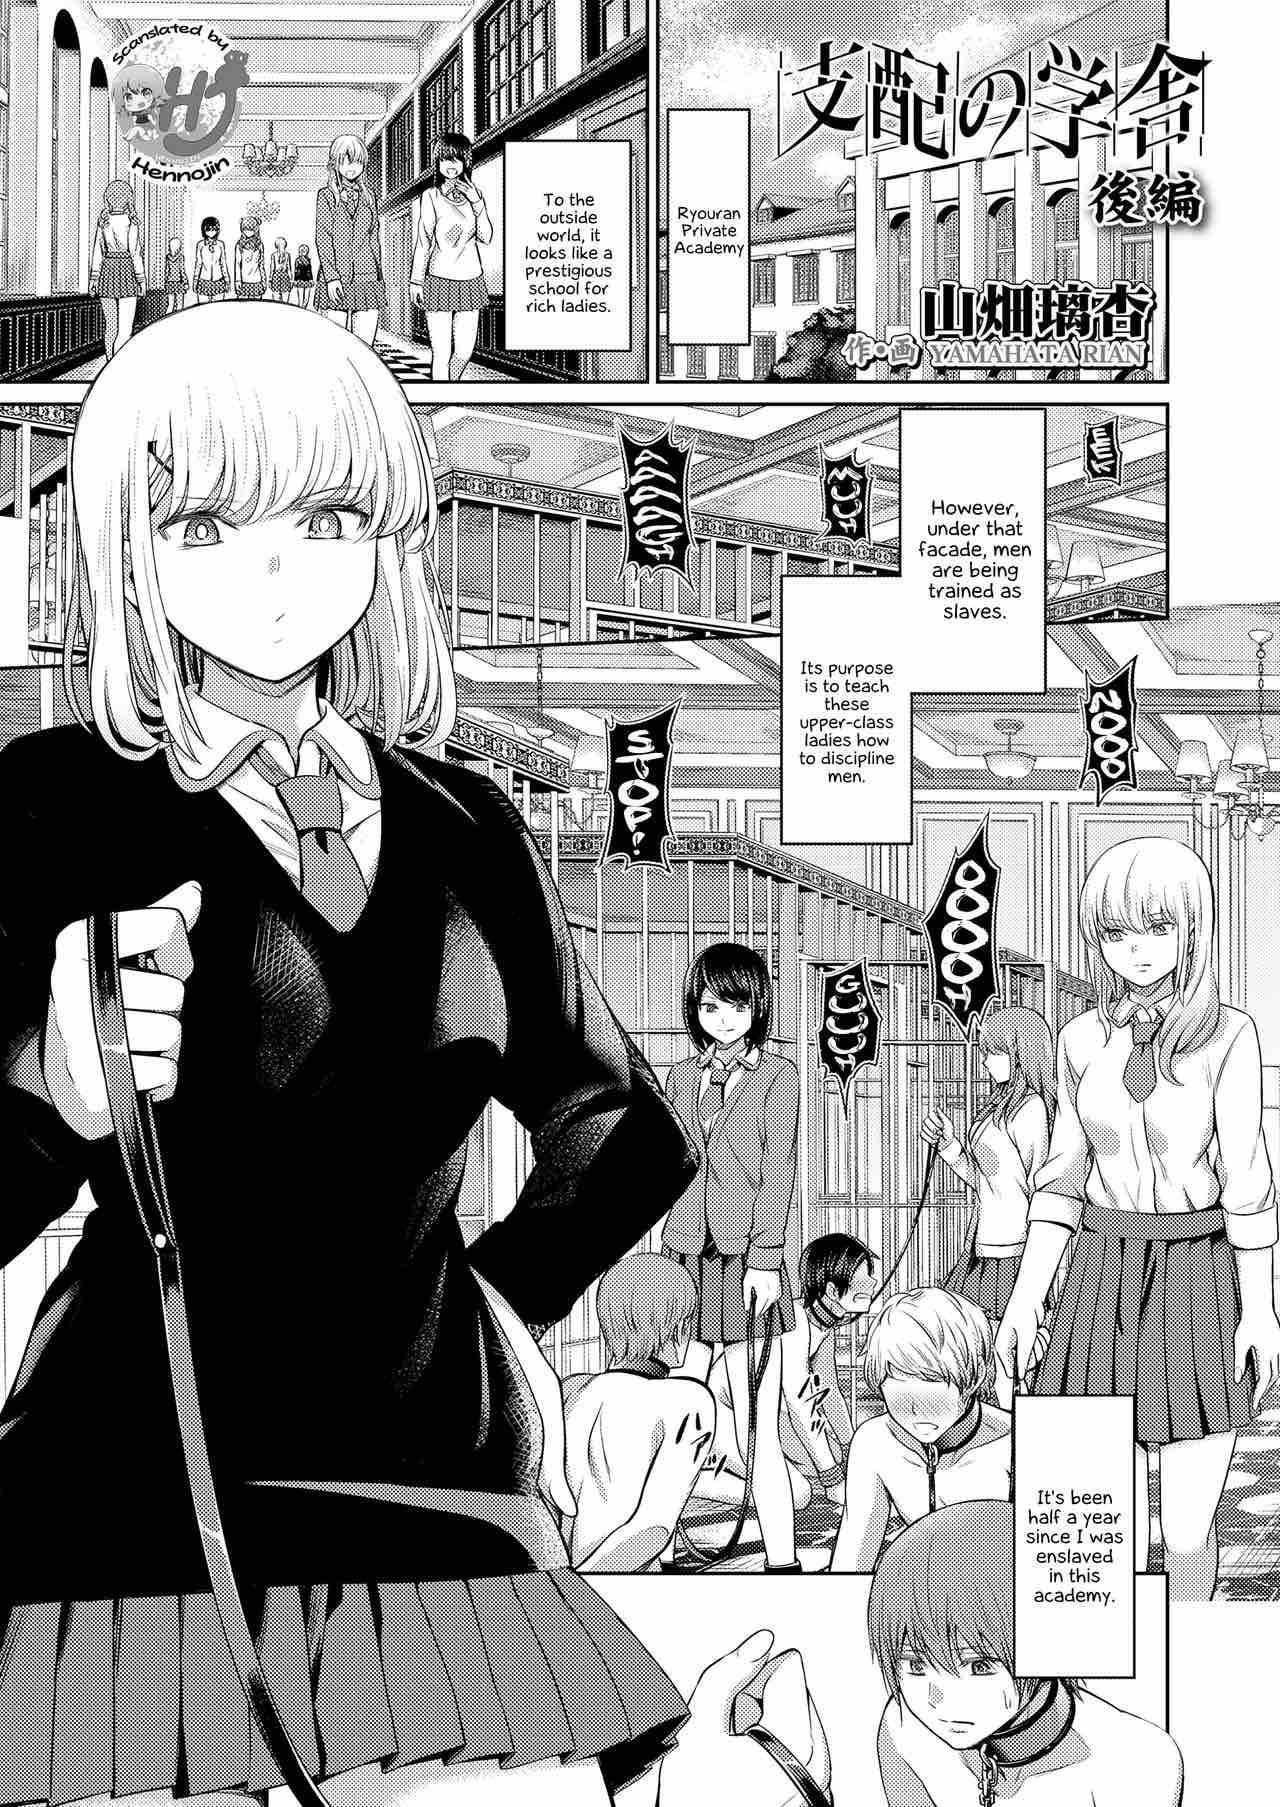 Anime Femdom Comics